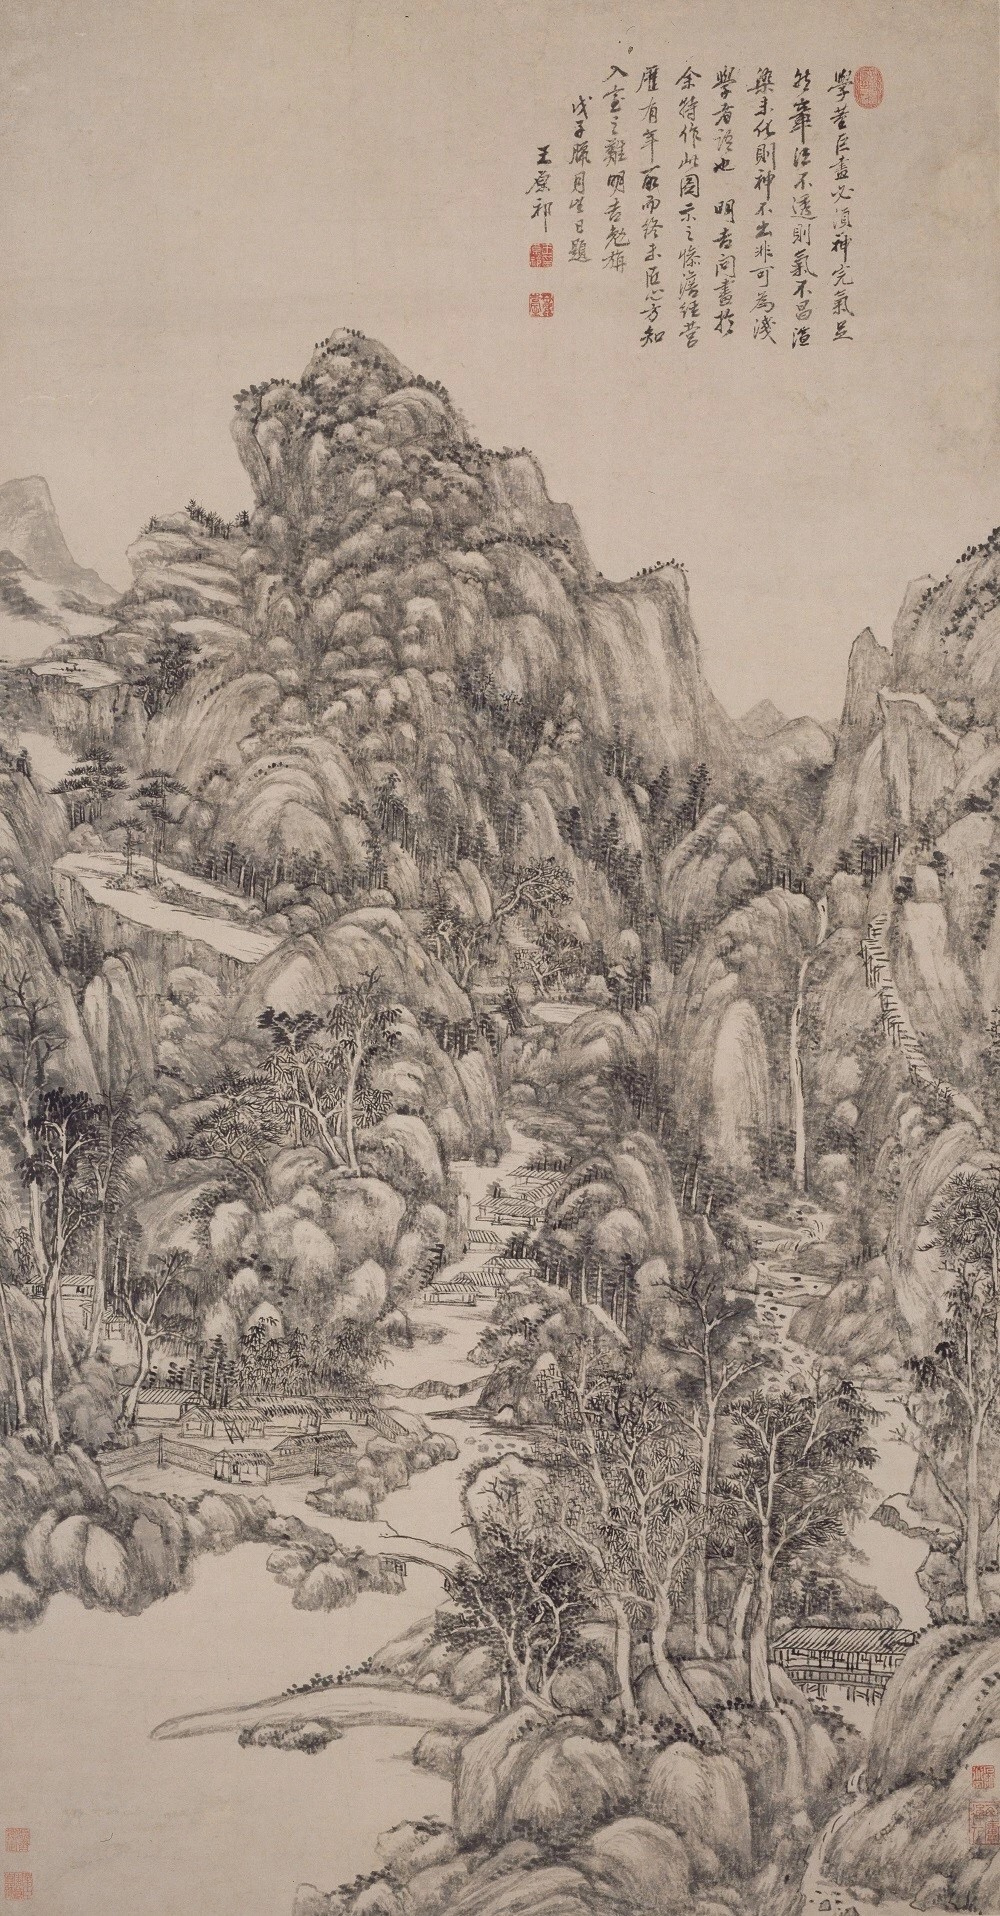 Wang Yuanqi: Robust and Vigorous Landscape